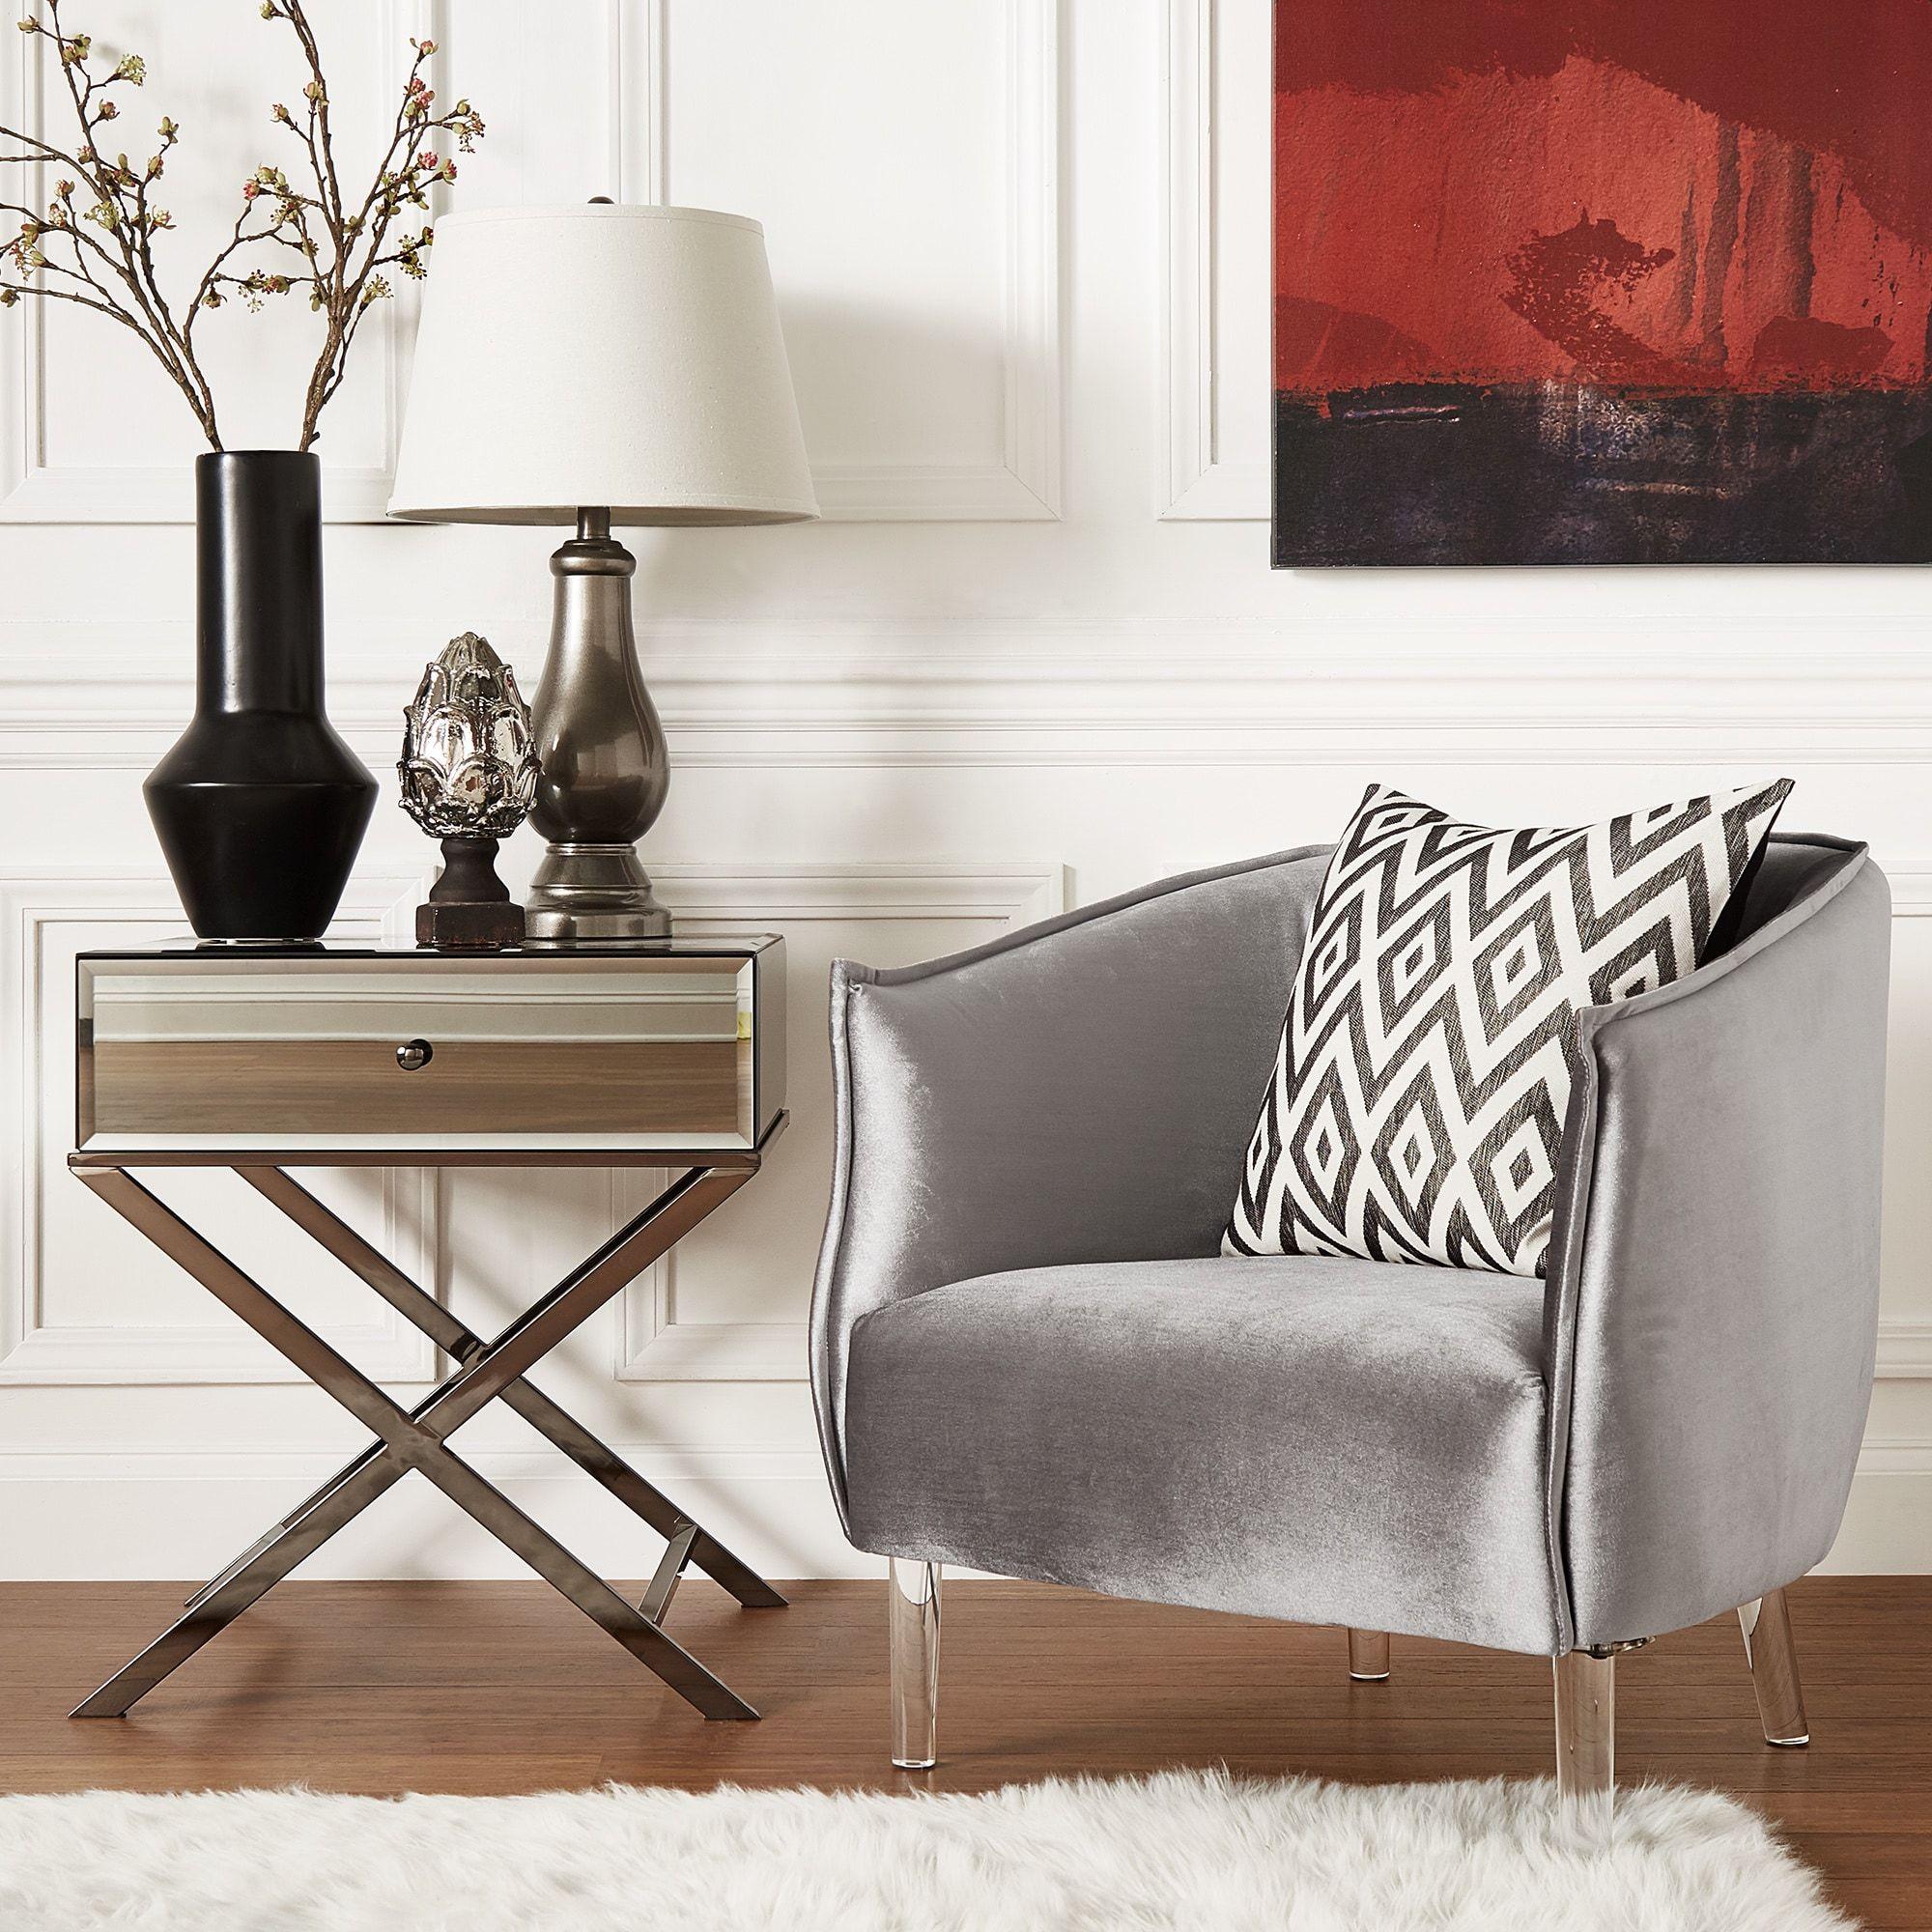 Vianne Velvet Curved Back Acrylic Leg Accent Chair by iNSPIRE Q Bold  (Silver Velvet), Clear